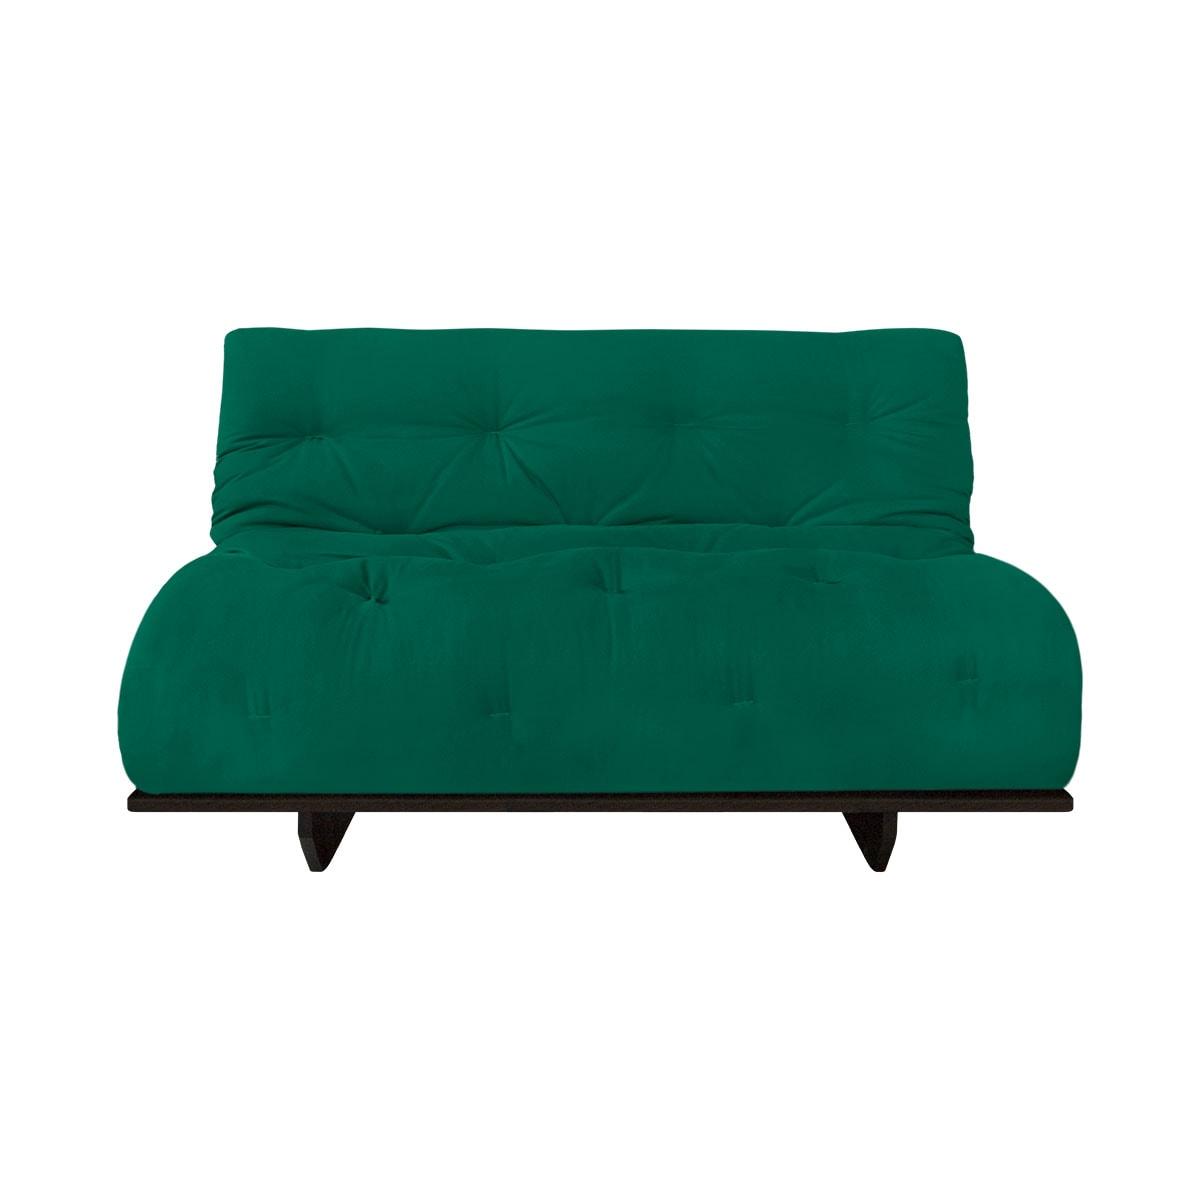 Sofa cama futon futon company - Sofas cama futon ...